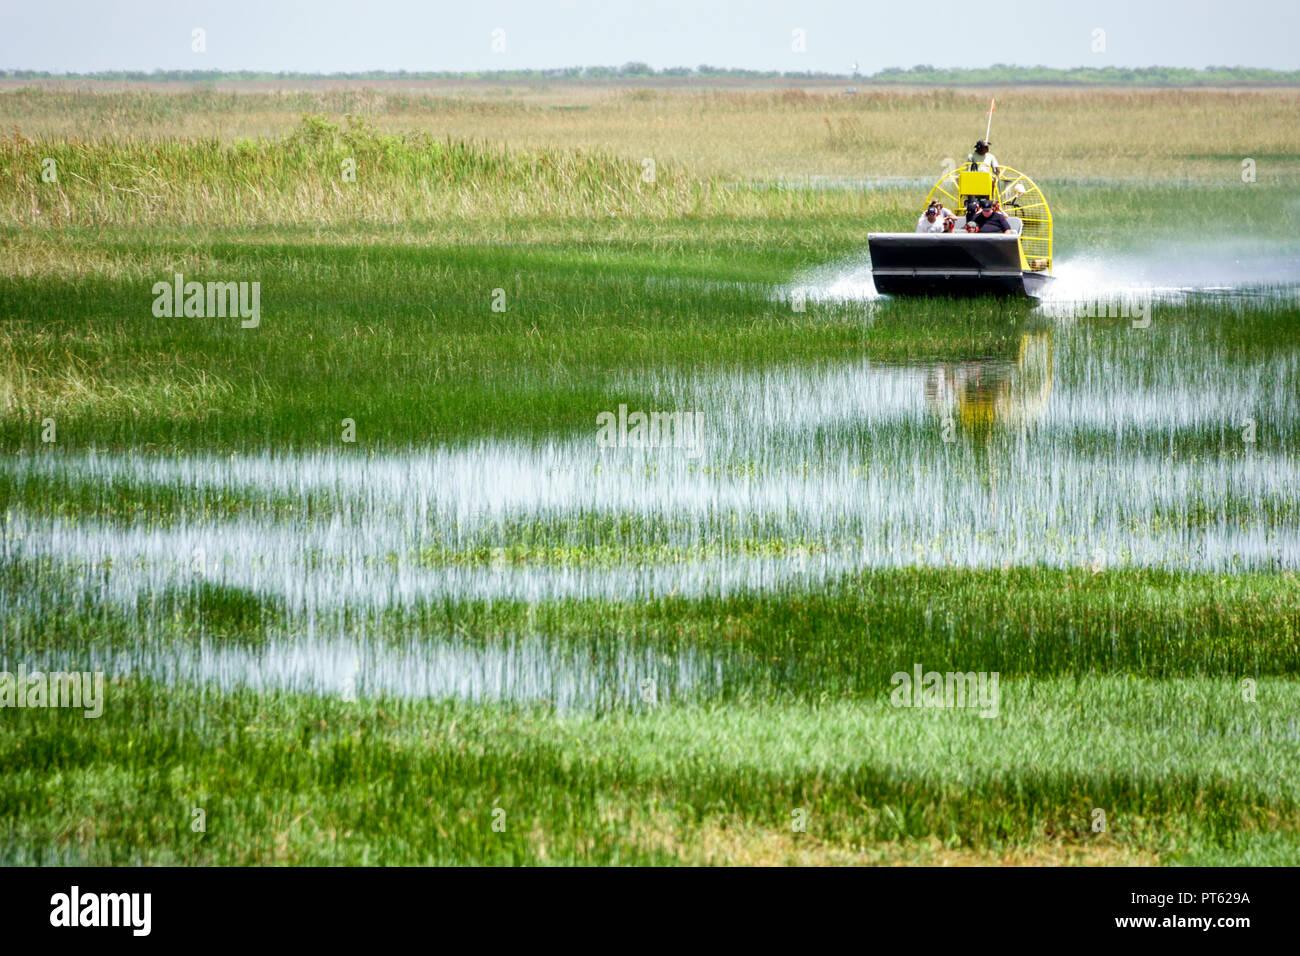 Miami Florida Everglades National Park airboat rider riders Black family couple man woman grass sawgrass water flat flatness pilot - Stock Image